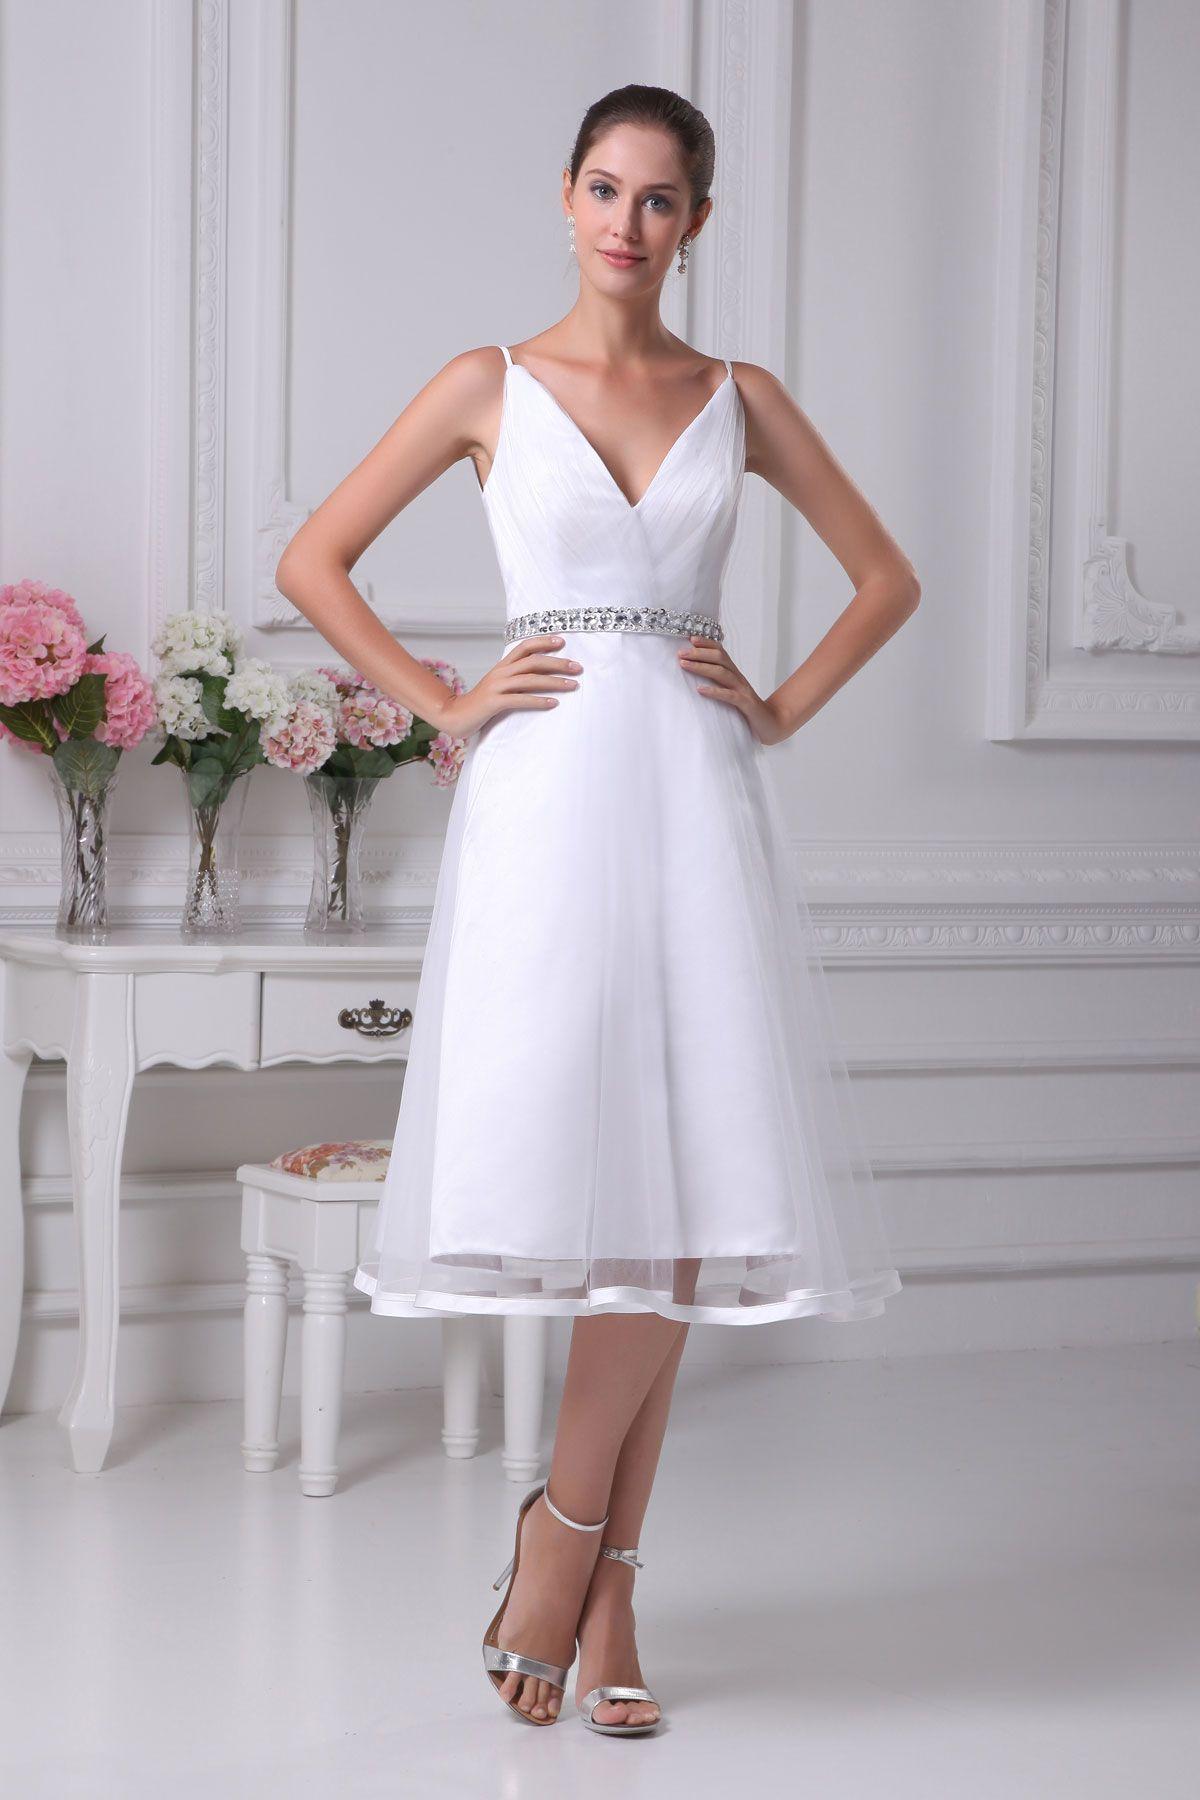 Long wedding reception dresses for the bride  Princess White Organza TeaLength Vneck Wedding Dress  Wedding